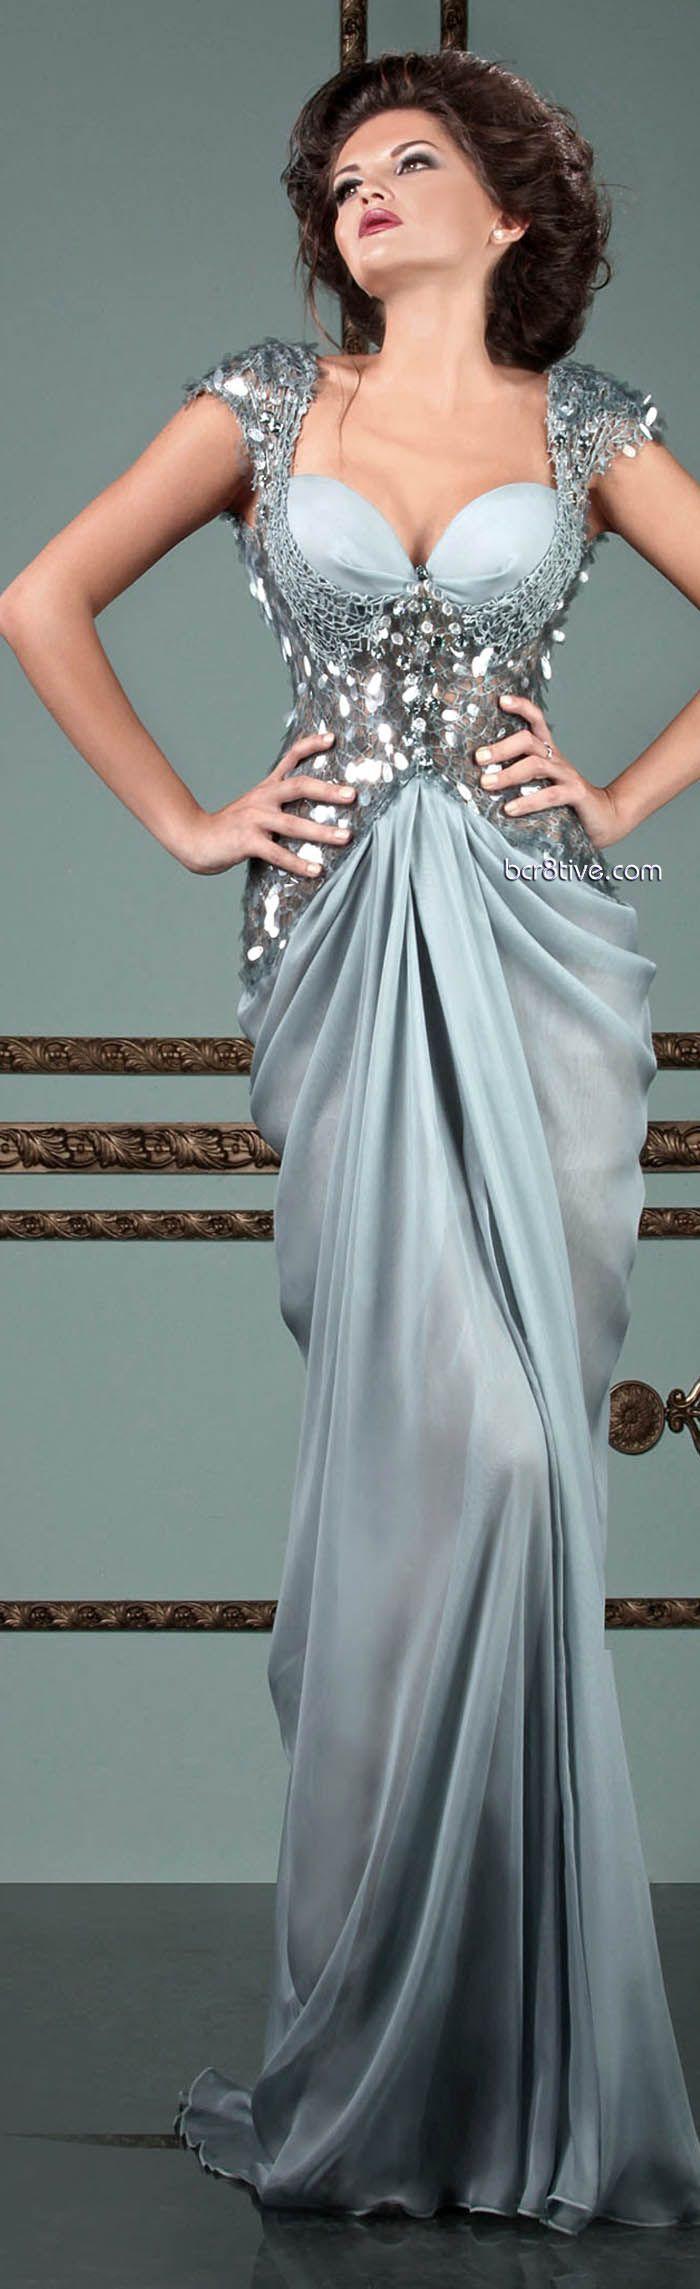 373 best Silver Gray Wedding Inspiration images on Pinterest | Dream ...